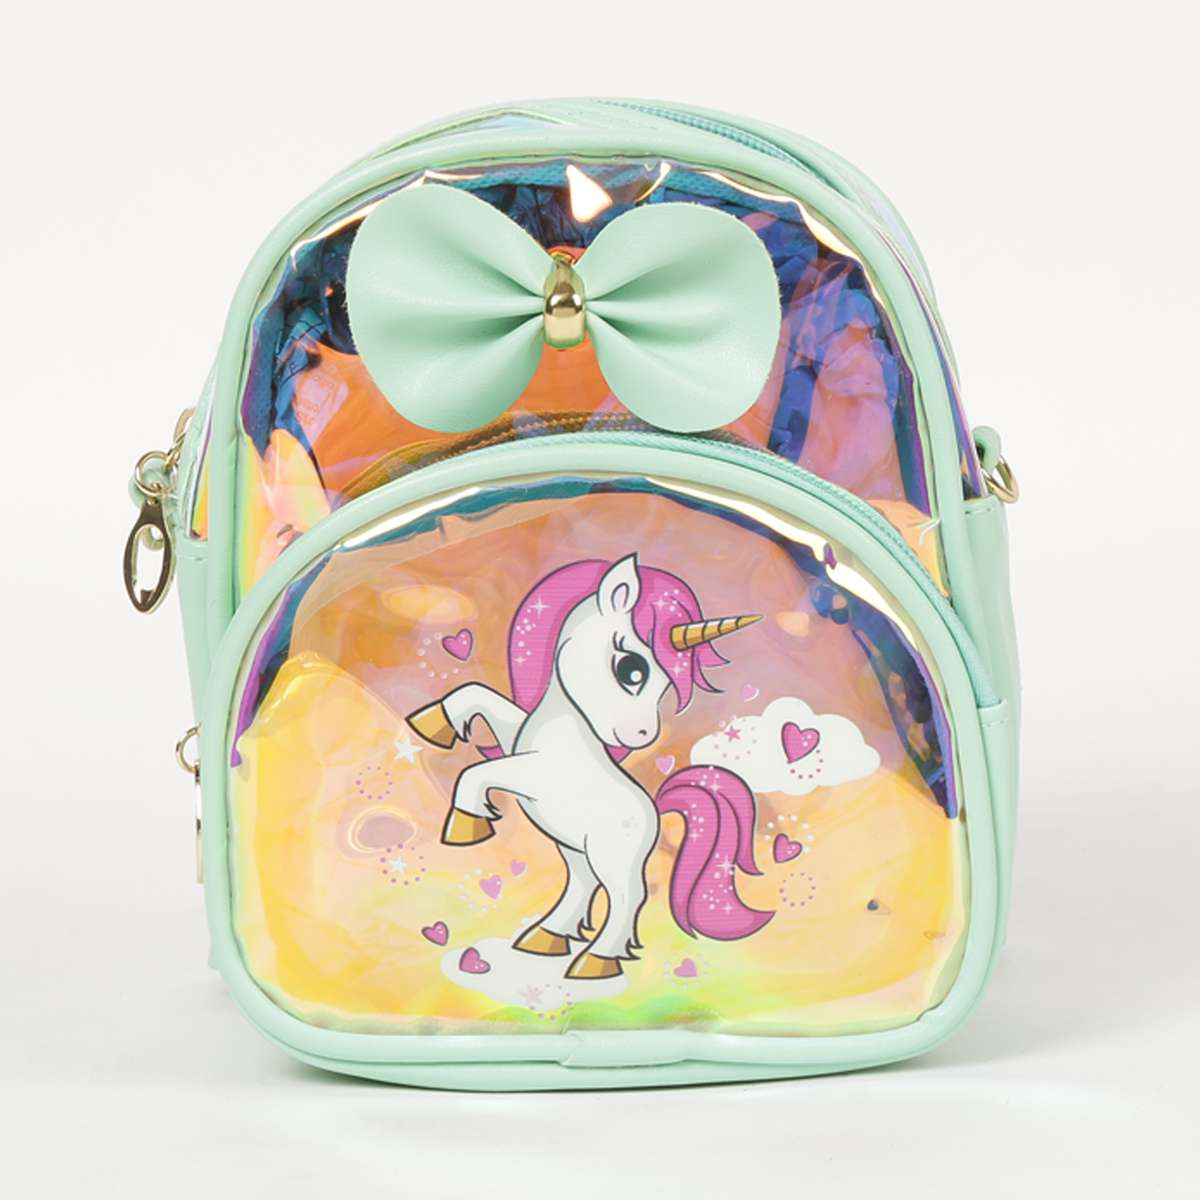 1.GINGER Girls Printed Zip-Closure Backpack